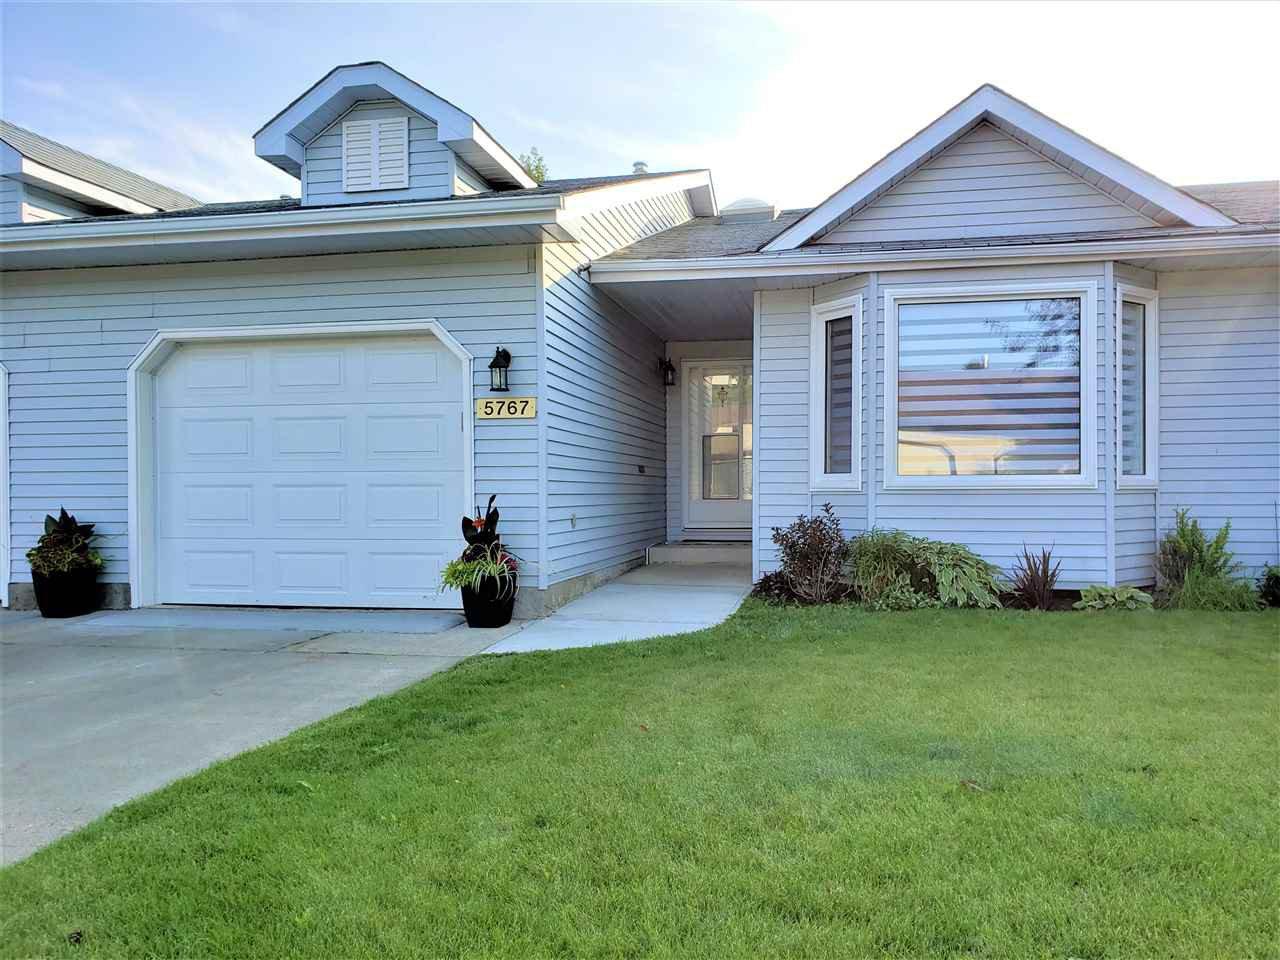 Main Photo: 5767 189 Street in Edmonton: Zone 20 Townhouse for sale : MLS®# E4170050